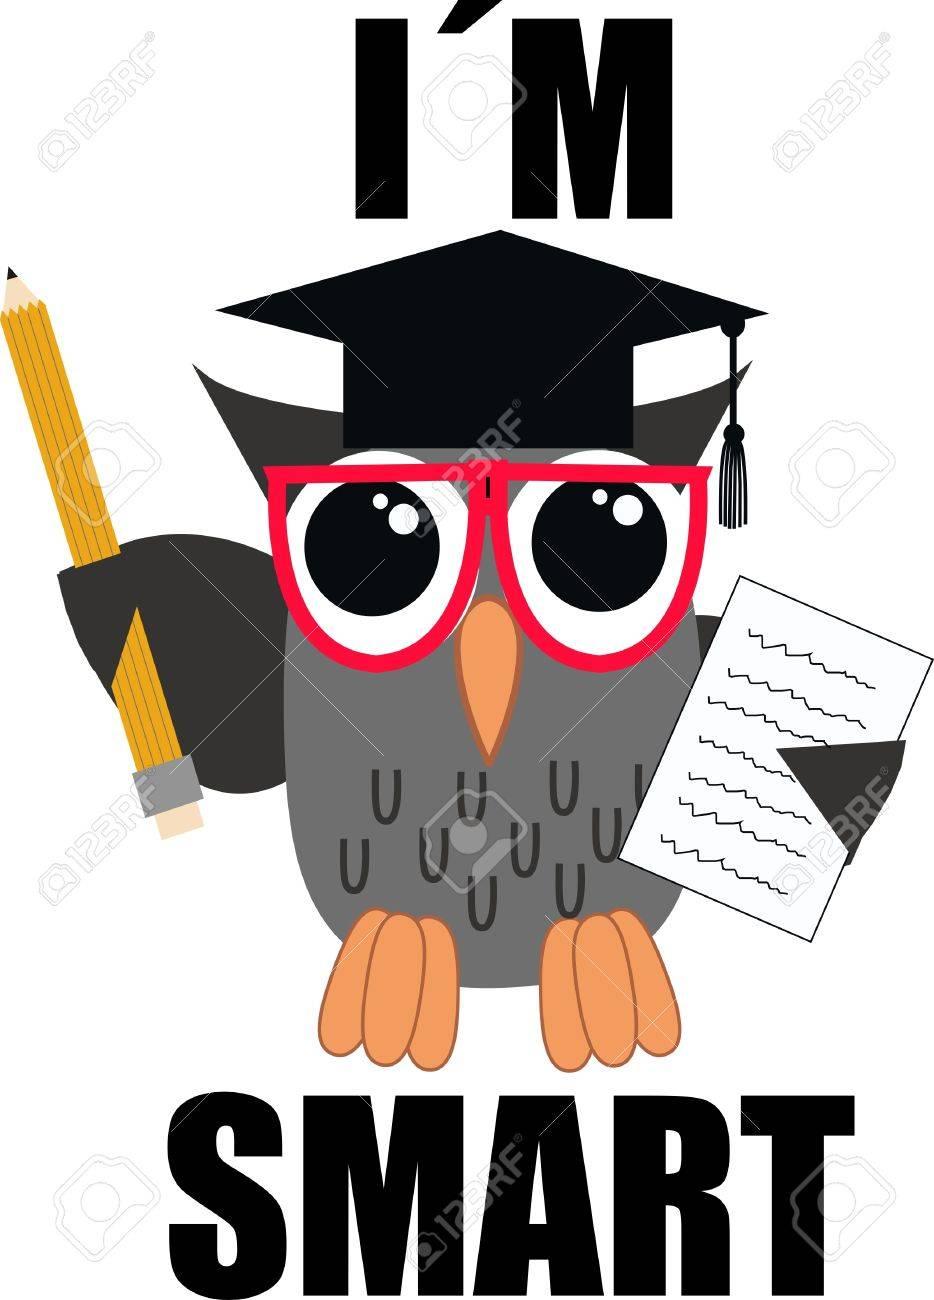 a smart owl.